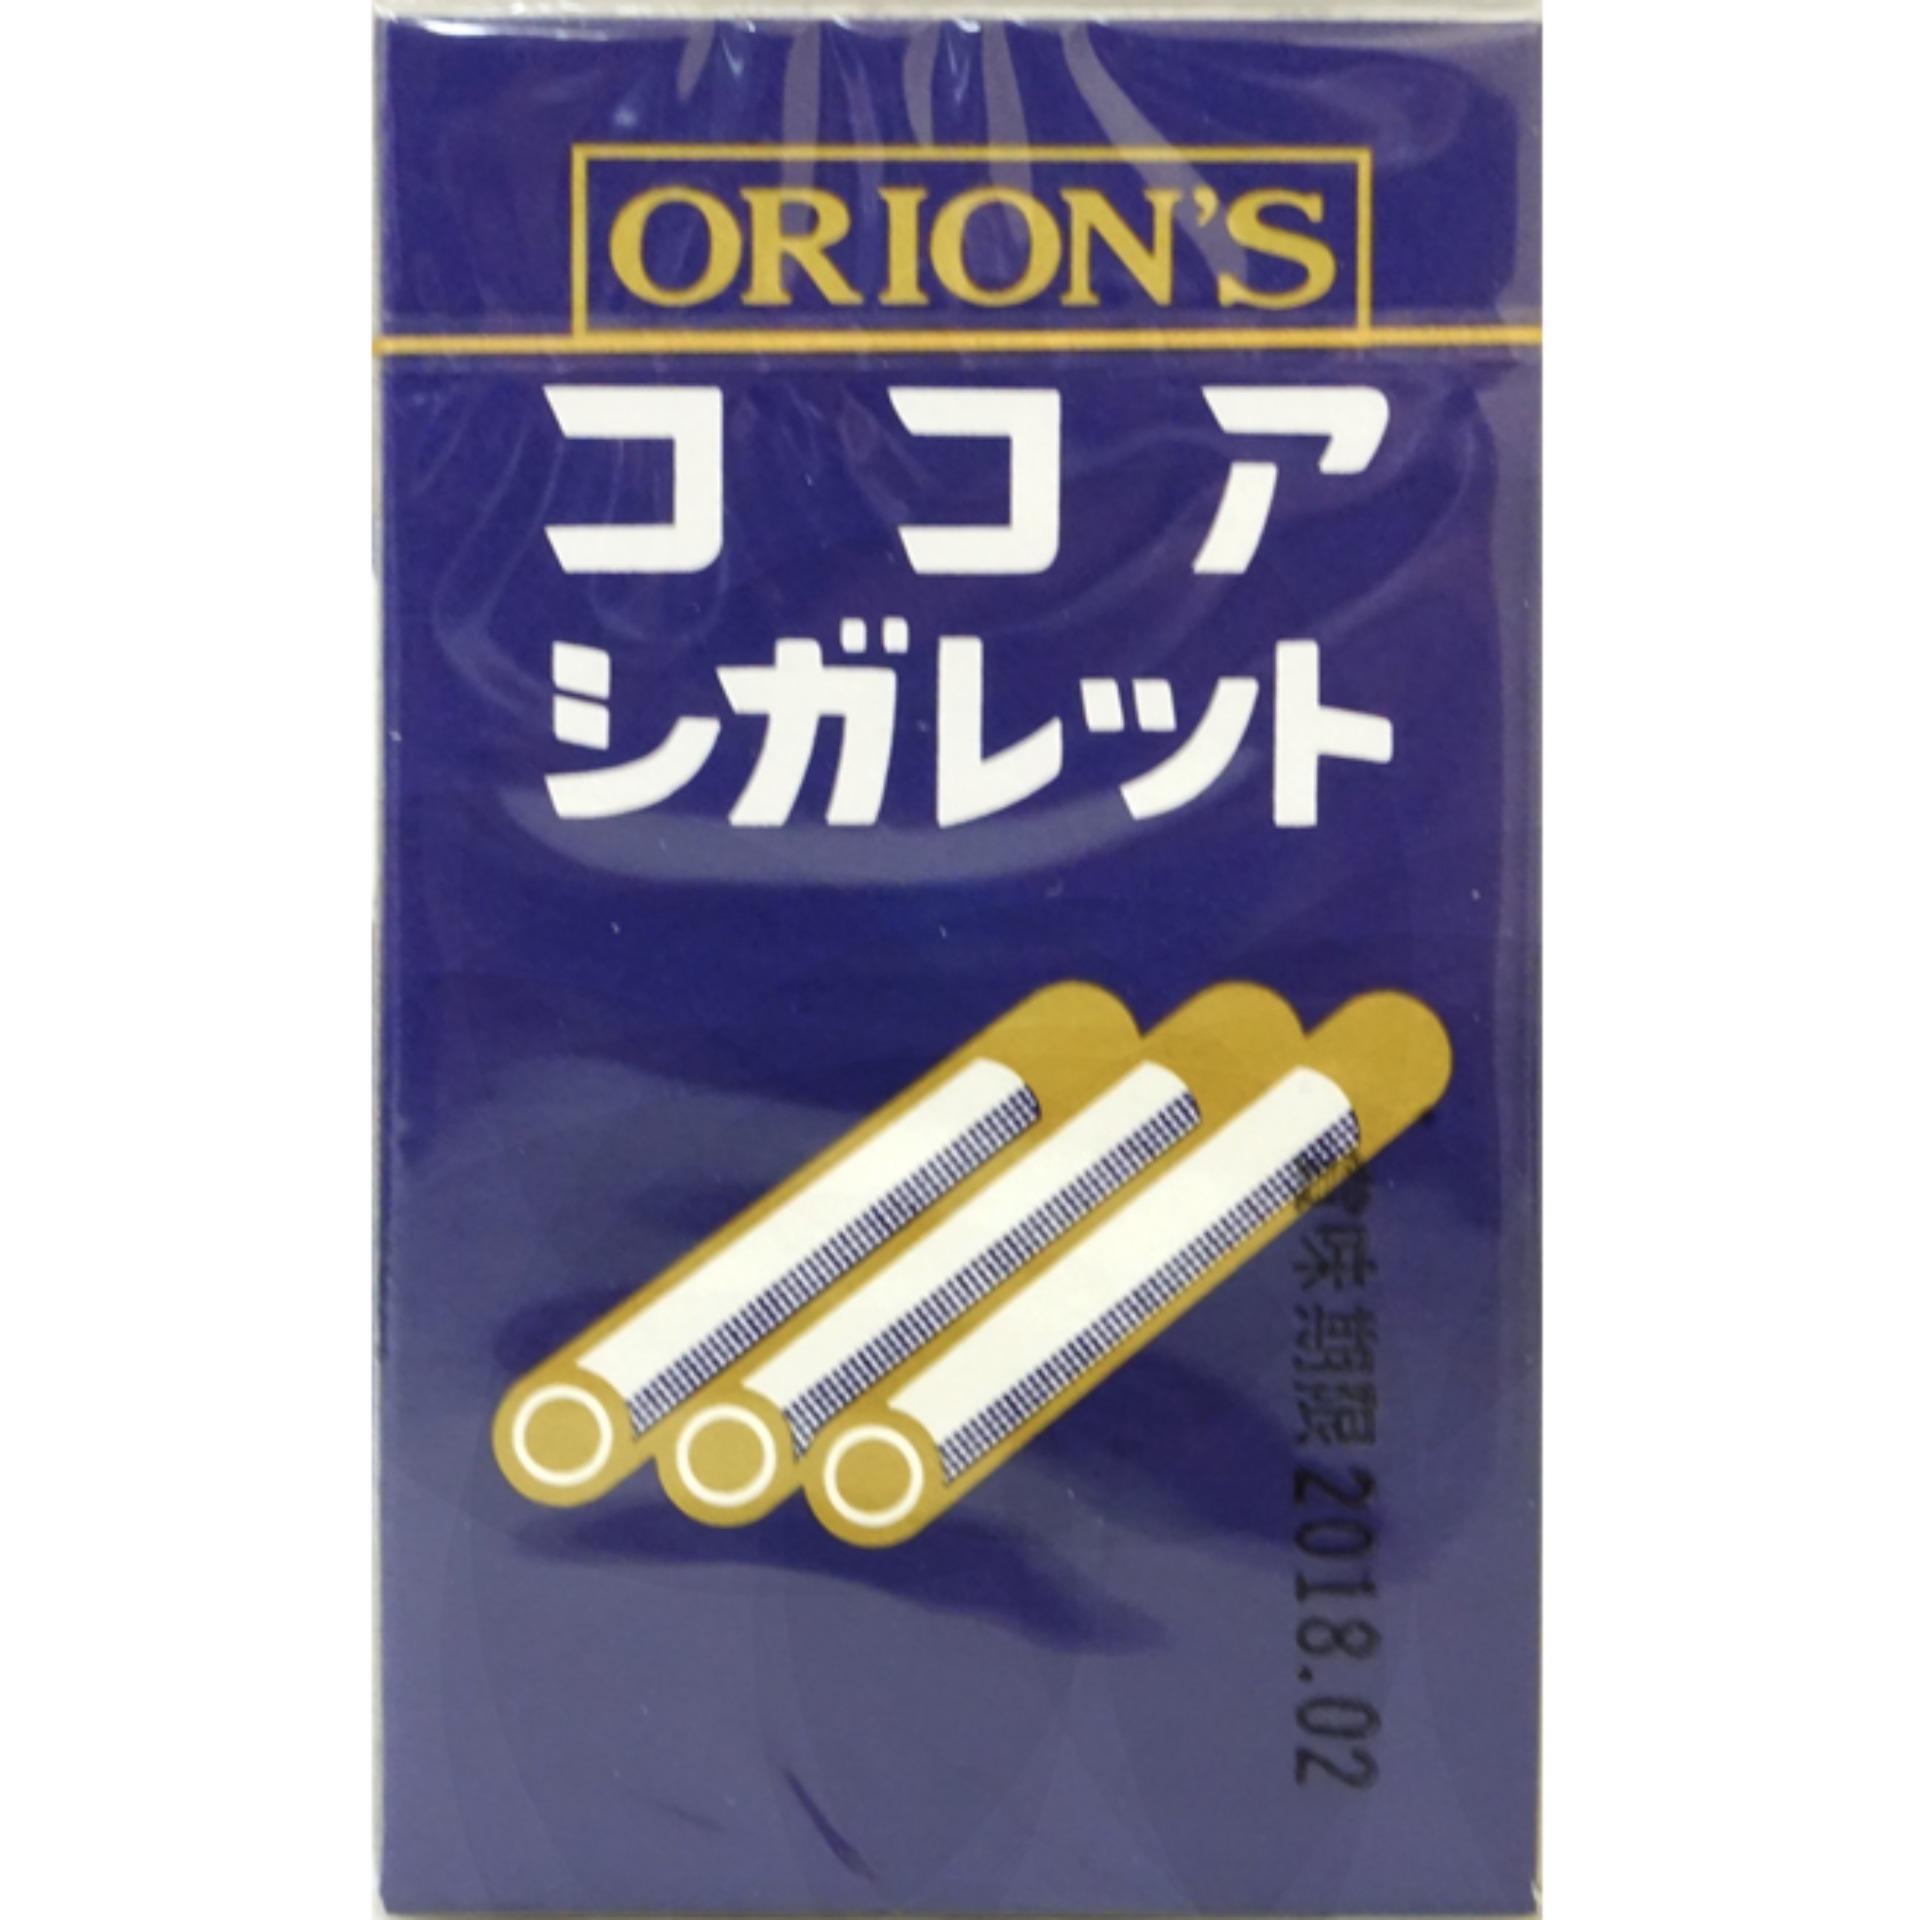 Kẹo điế.u thuốc Orion vị Chocolate